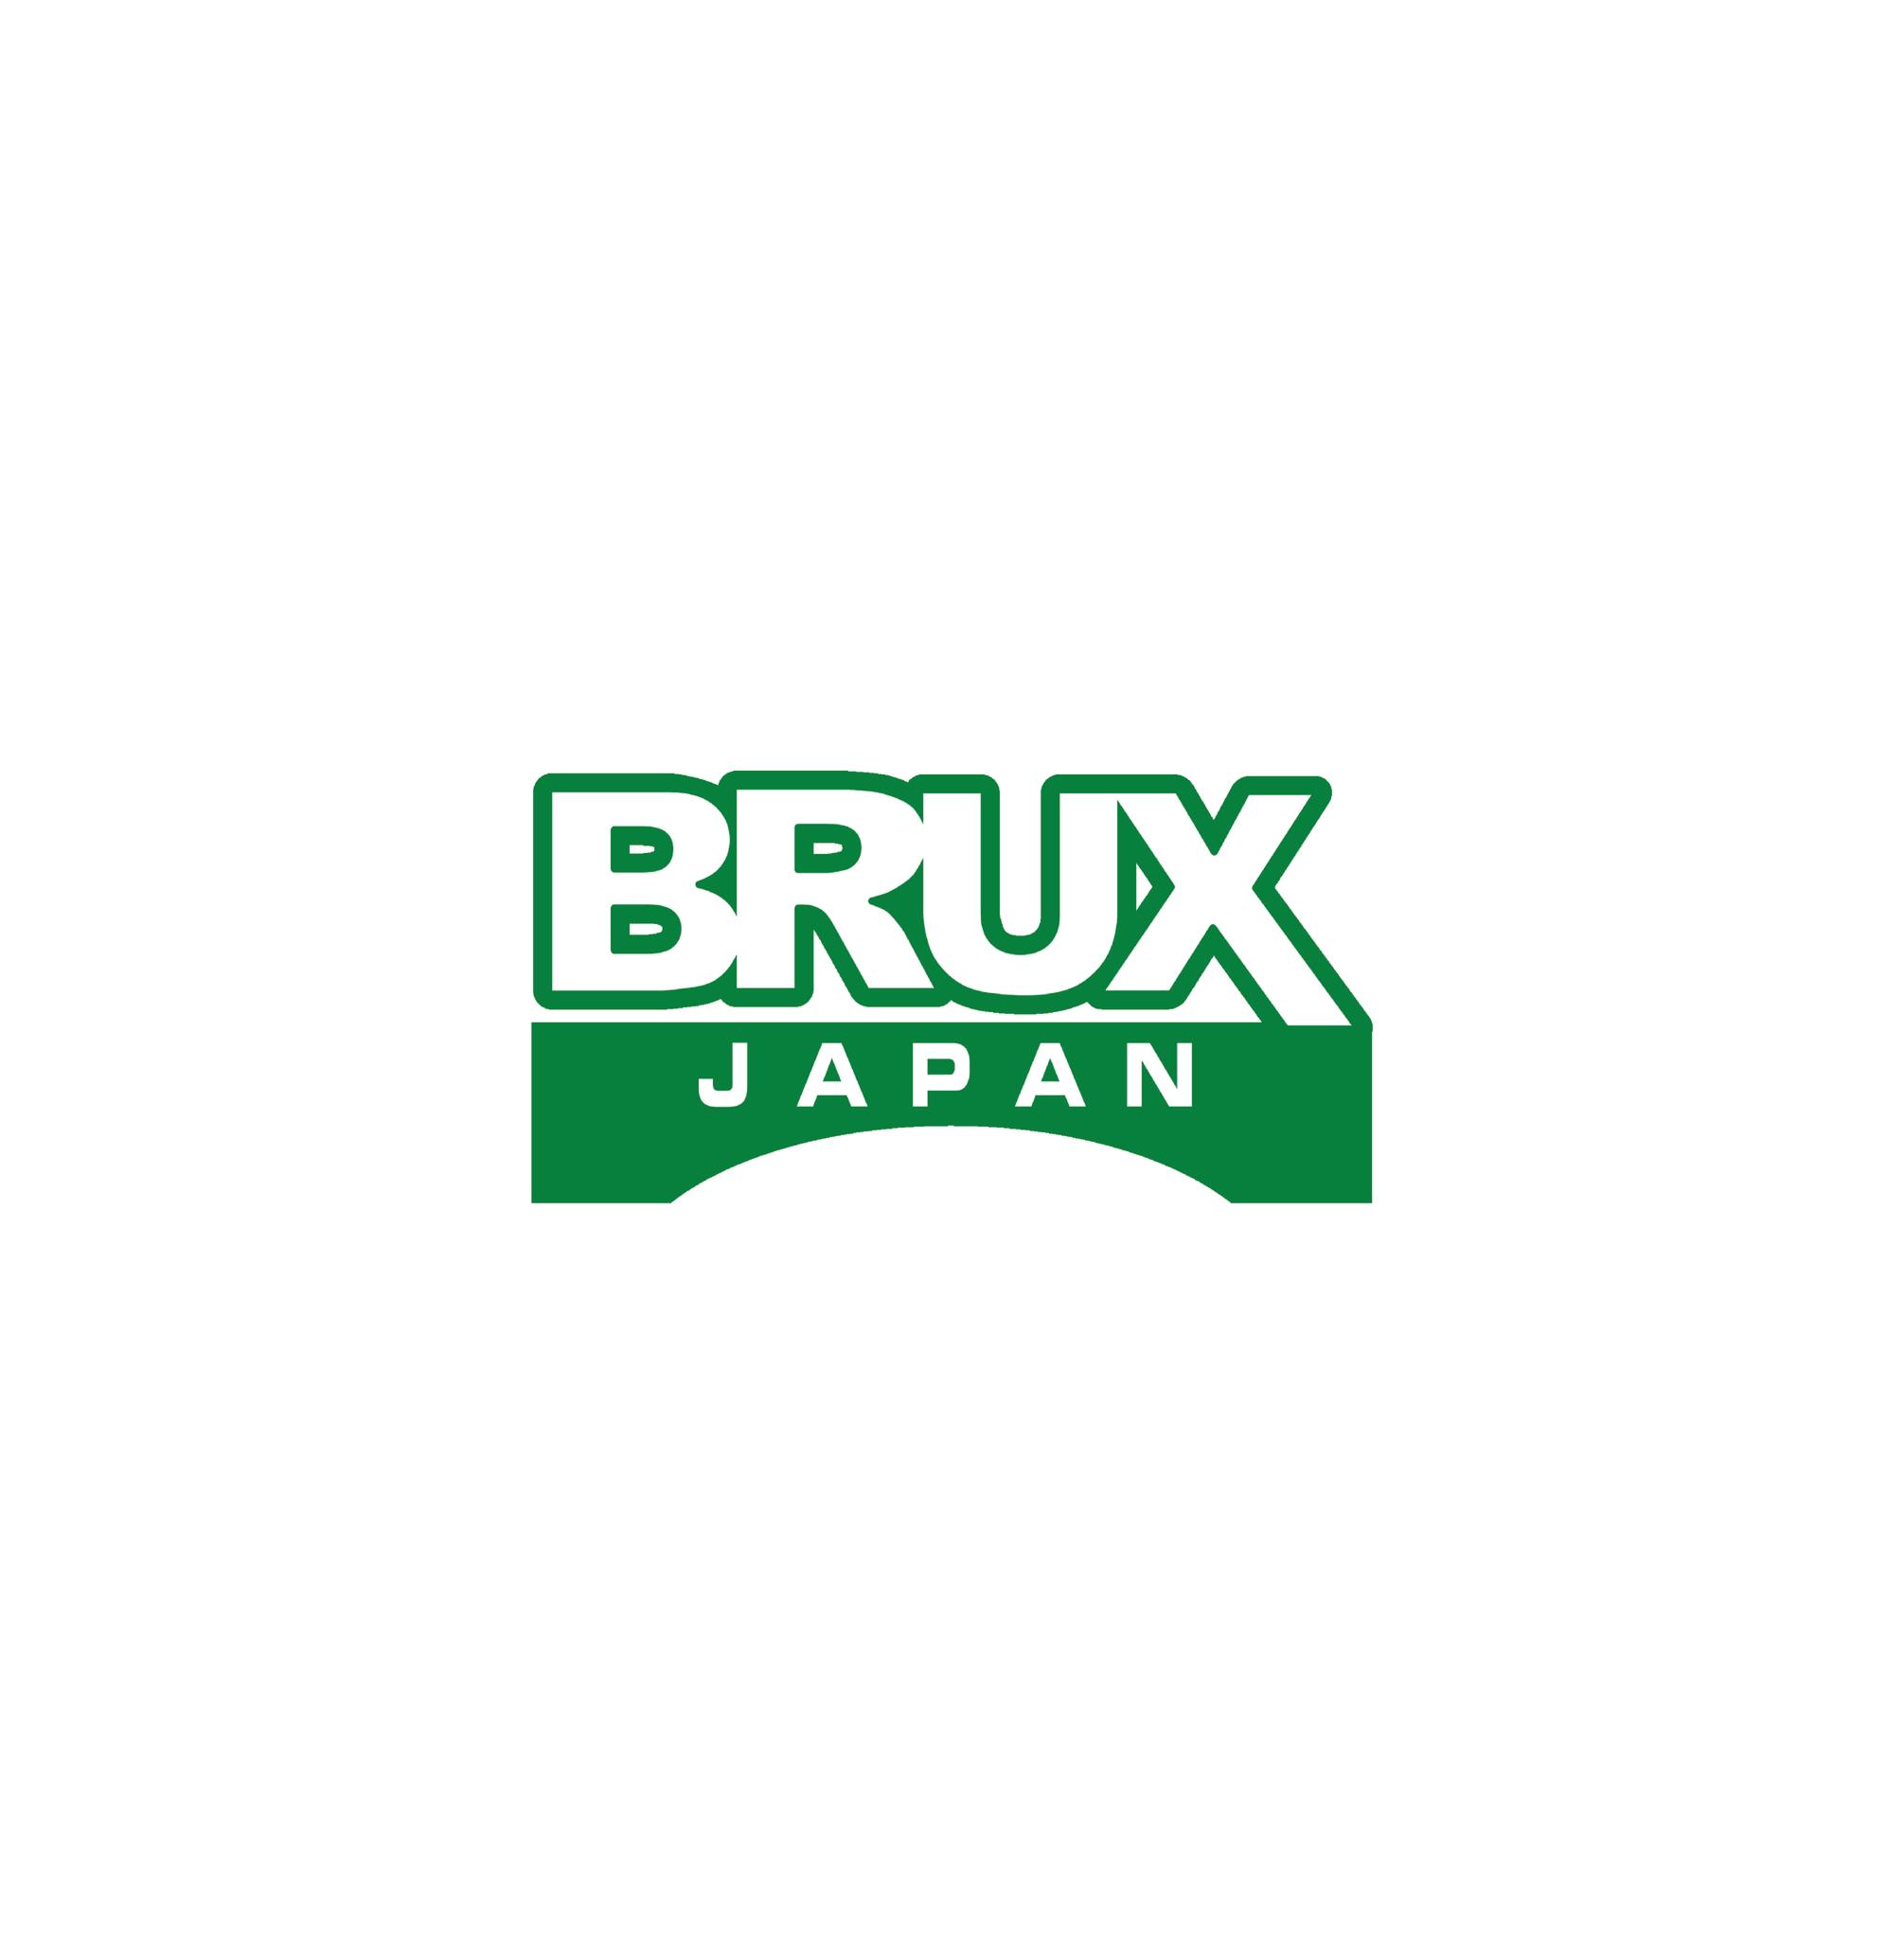 BRUX JAPAN CO. LTD.